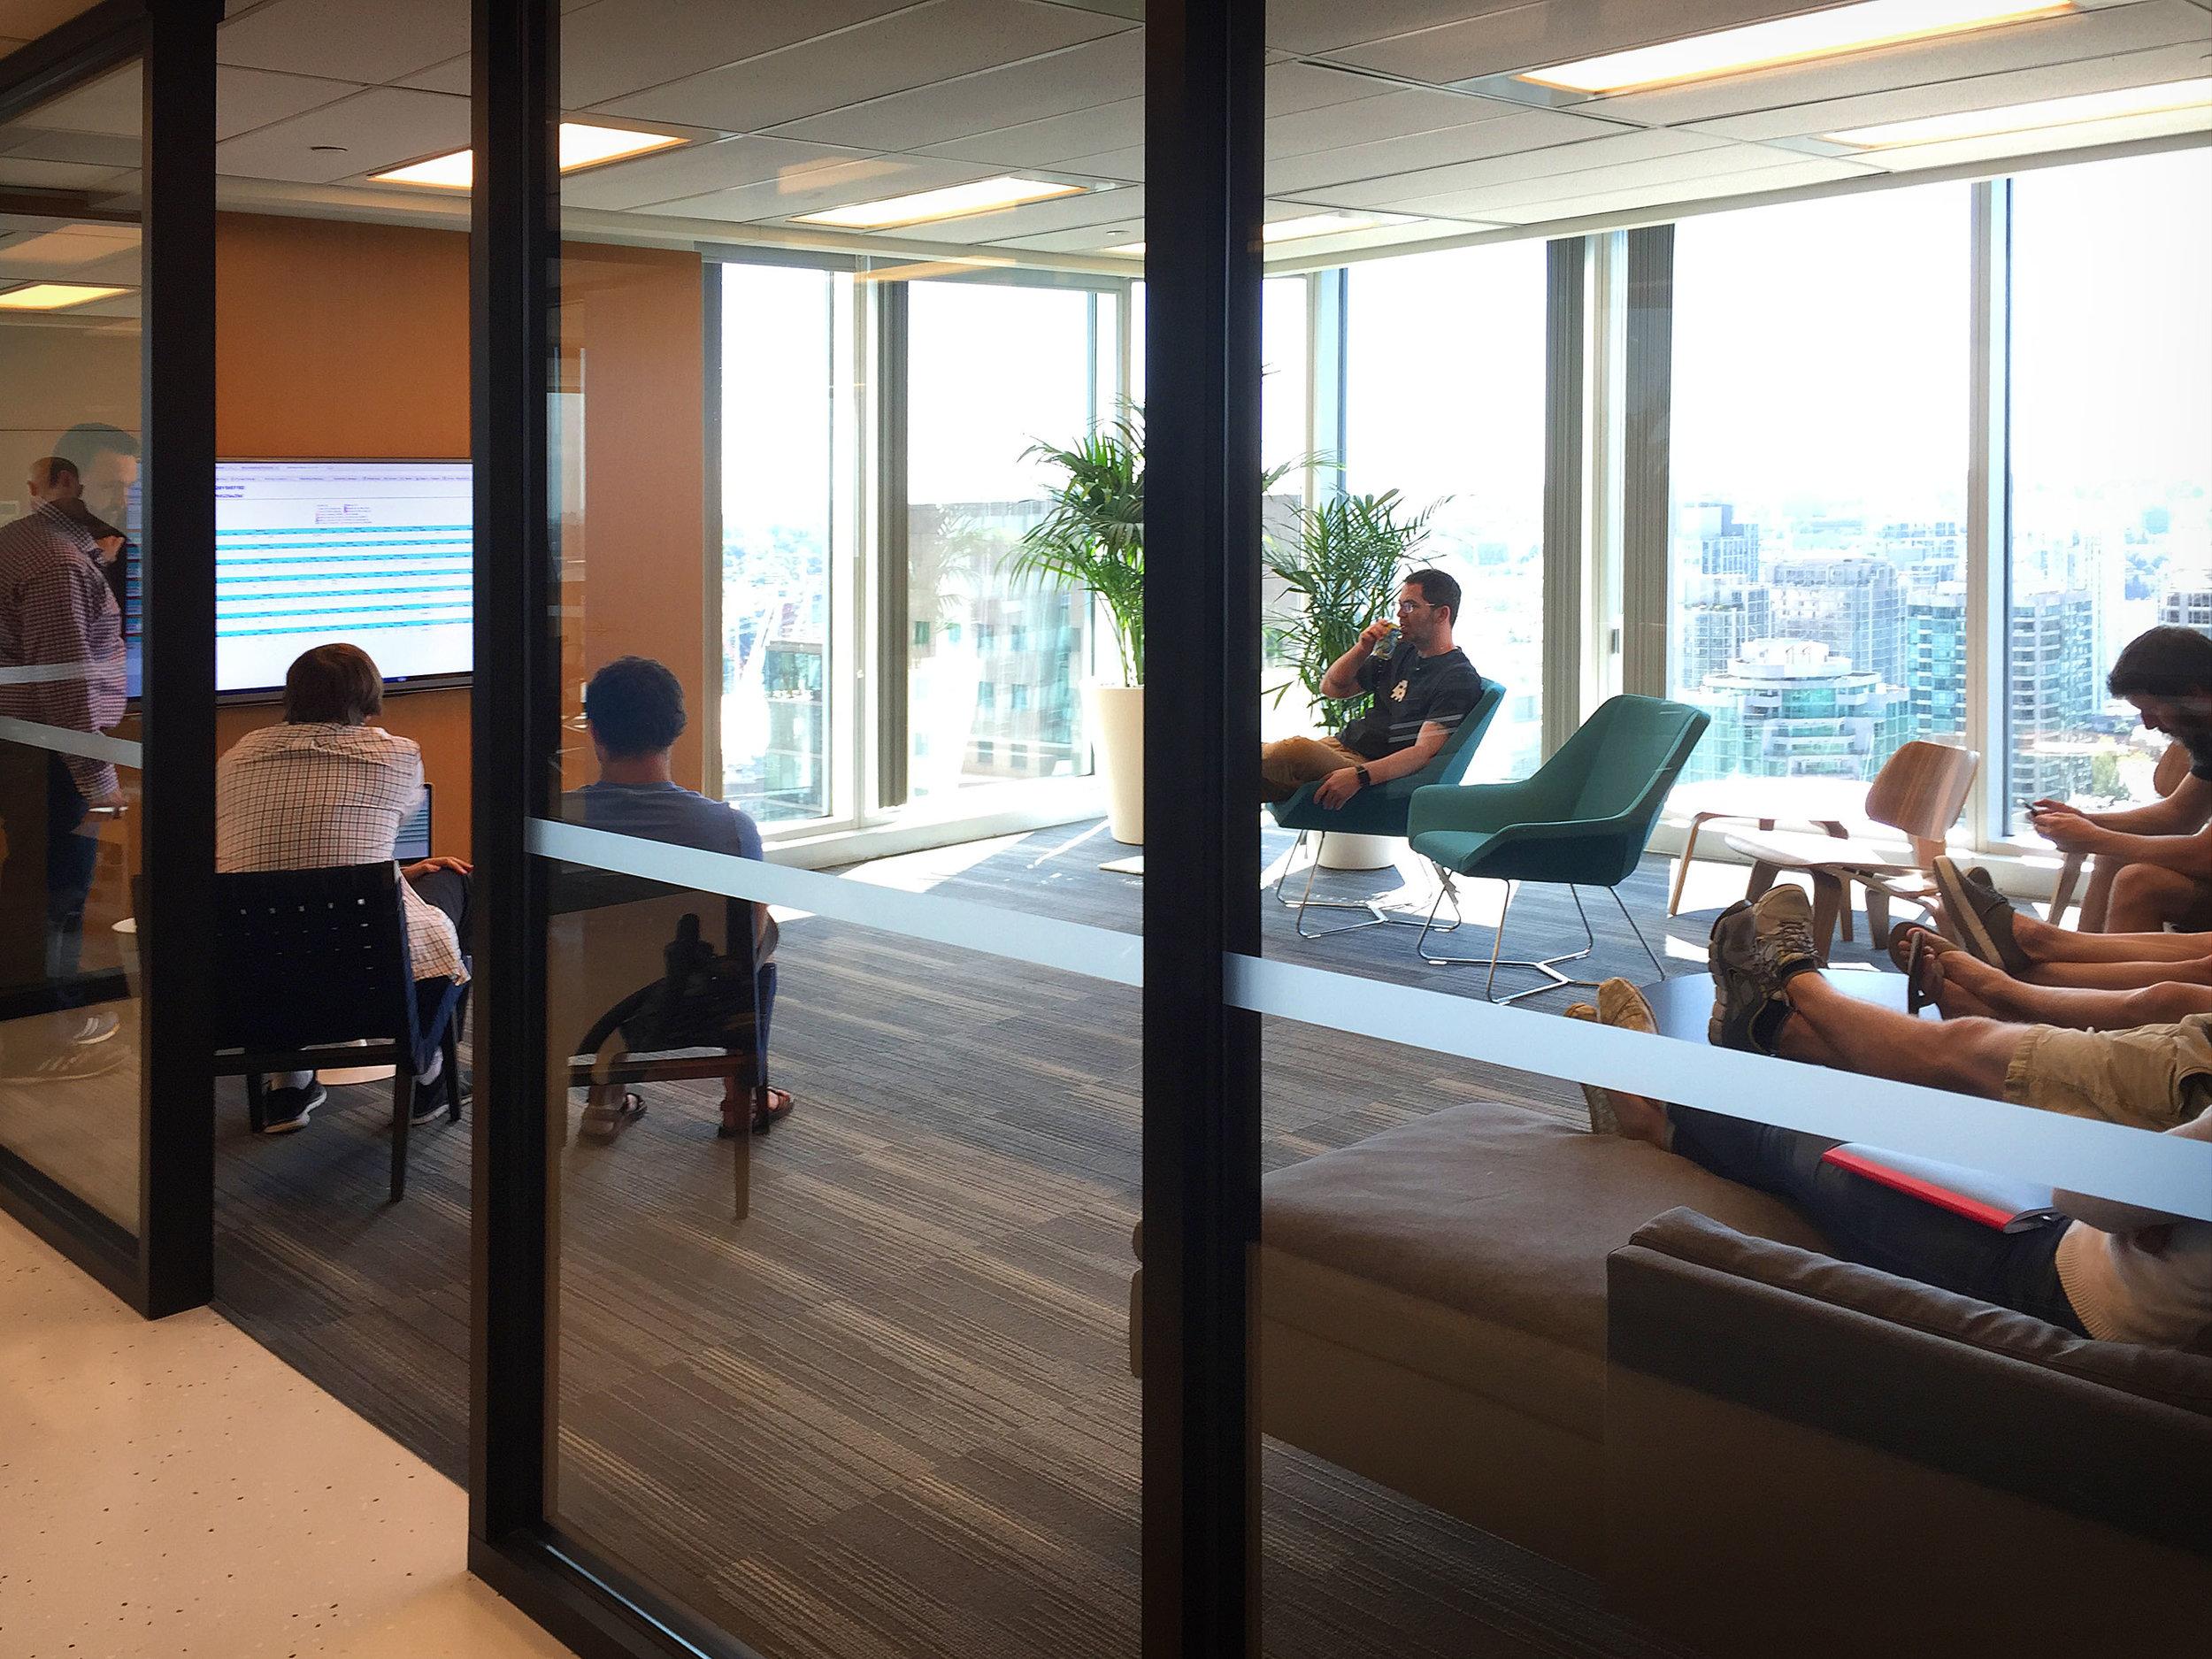 Office-Wide Meeting Spaces